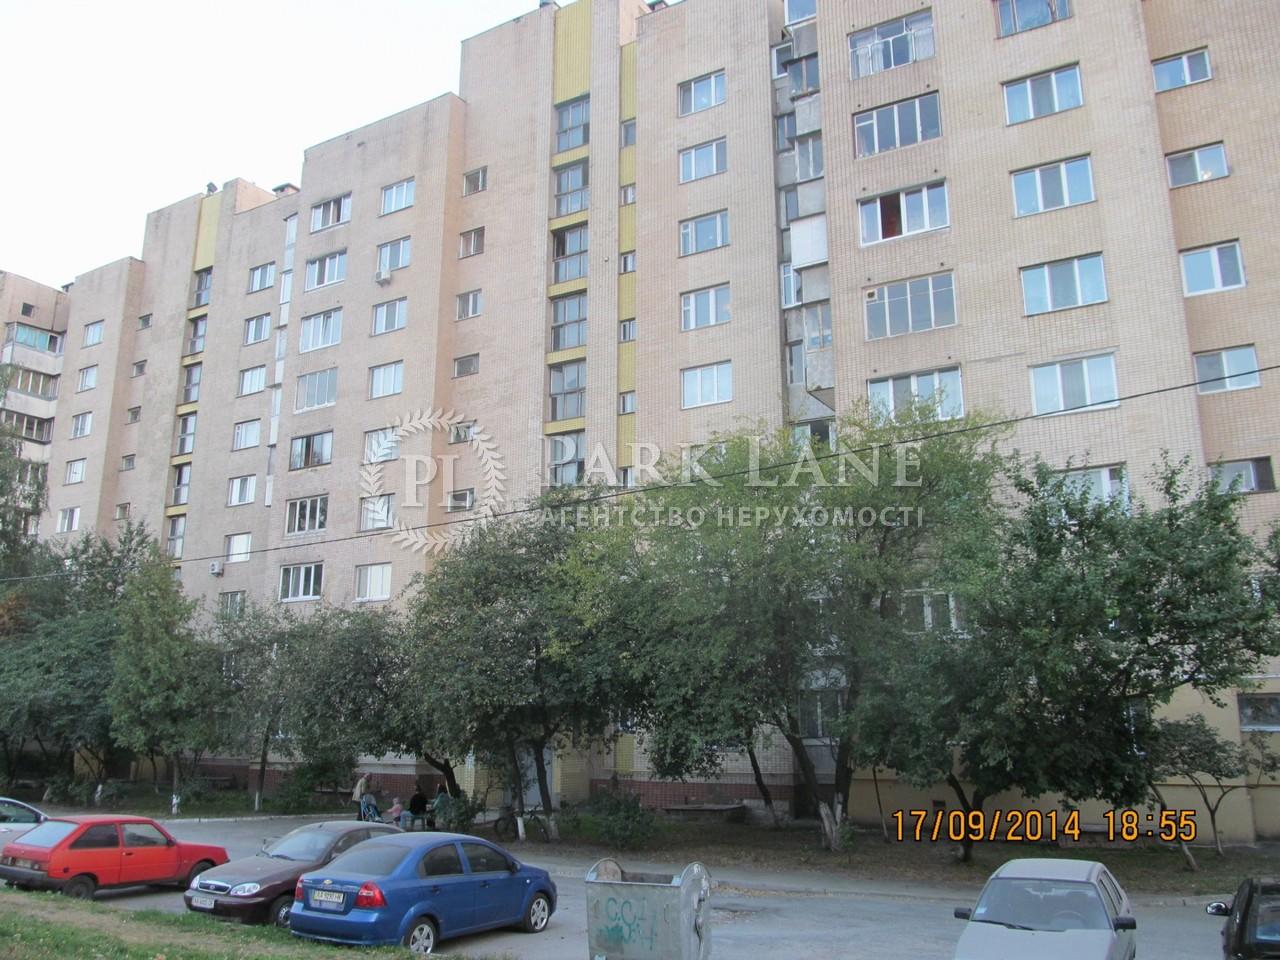 Квартира ул. Симиренко, 2/19, Киев, Z-1334476 - Фото 1